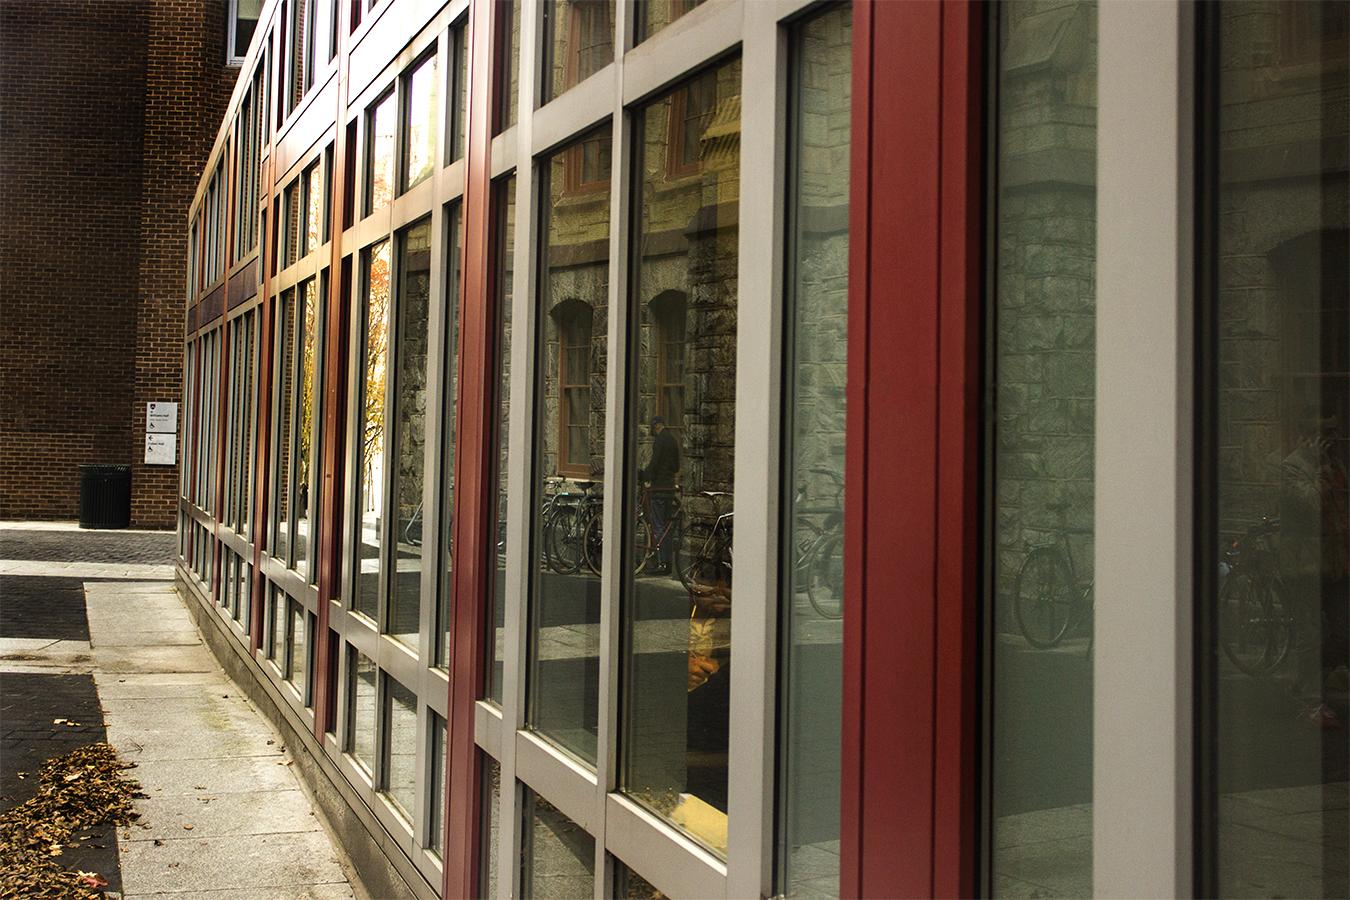 Yash Killa_StillLife_Philadelphia_Pattern_Repetition_Galss_Structure_colours_Beams_Reflection_glass